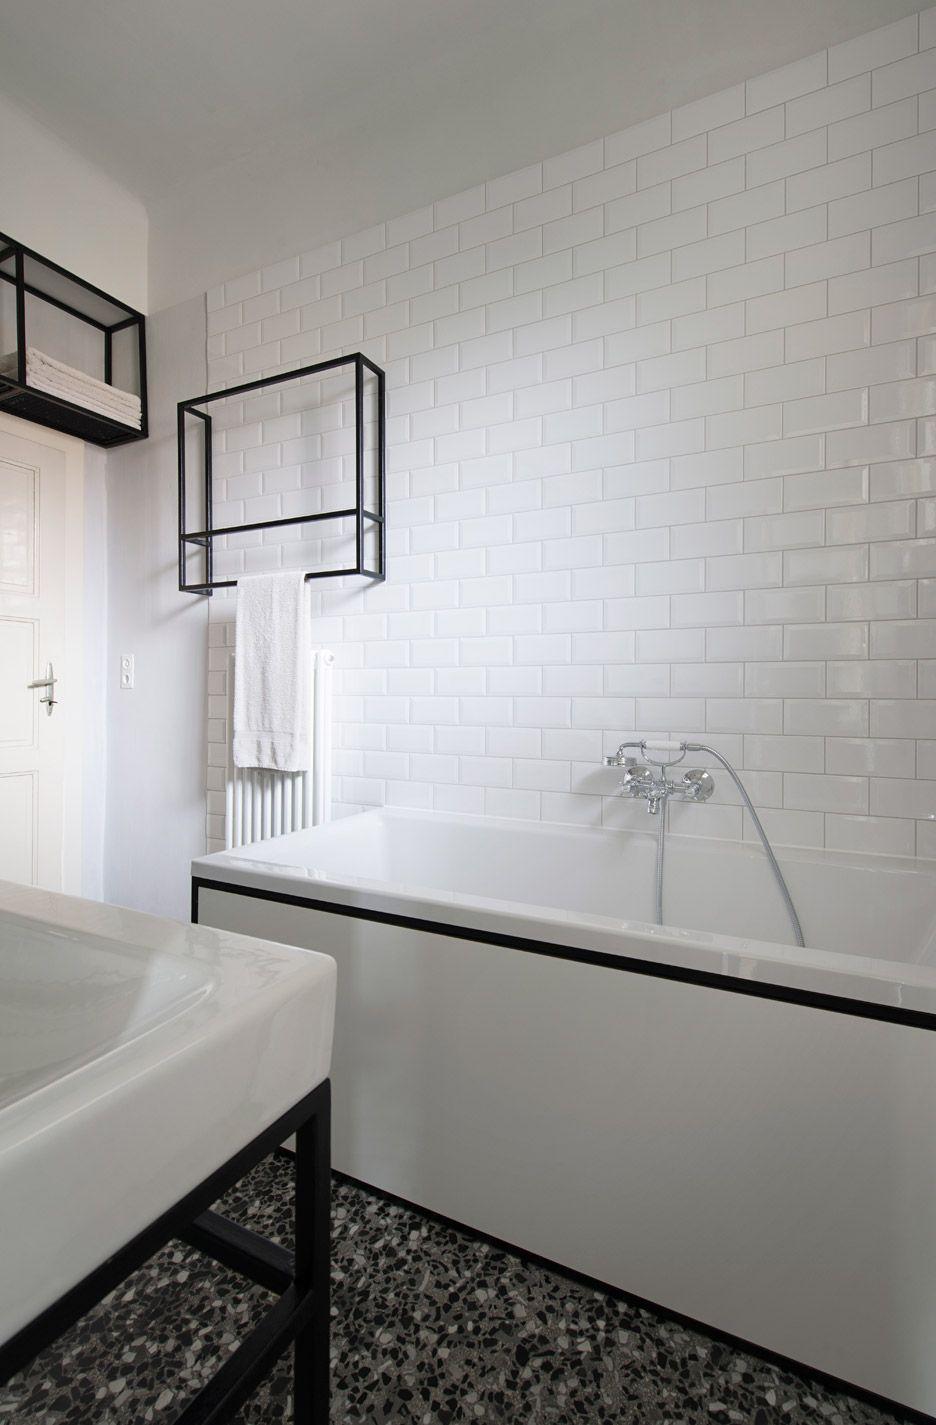 IFUB uncovers parquet flooring in 1930s Art-Deco apartment ...